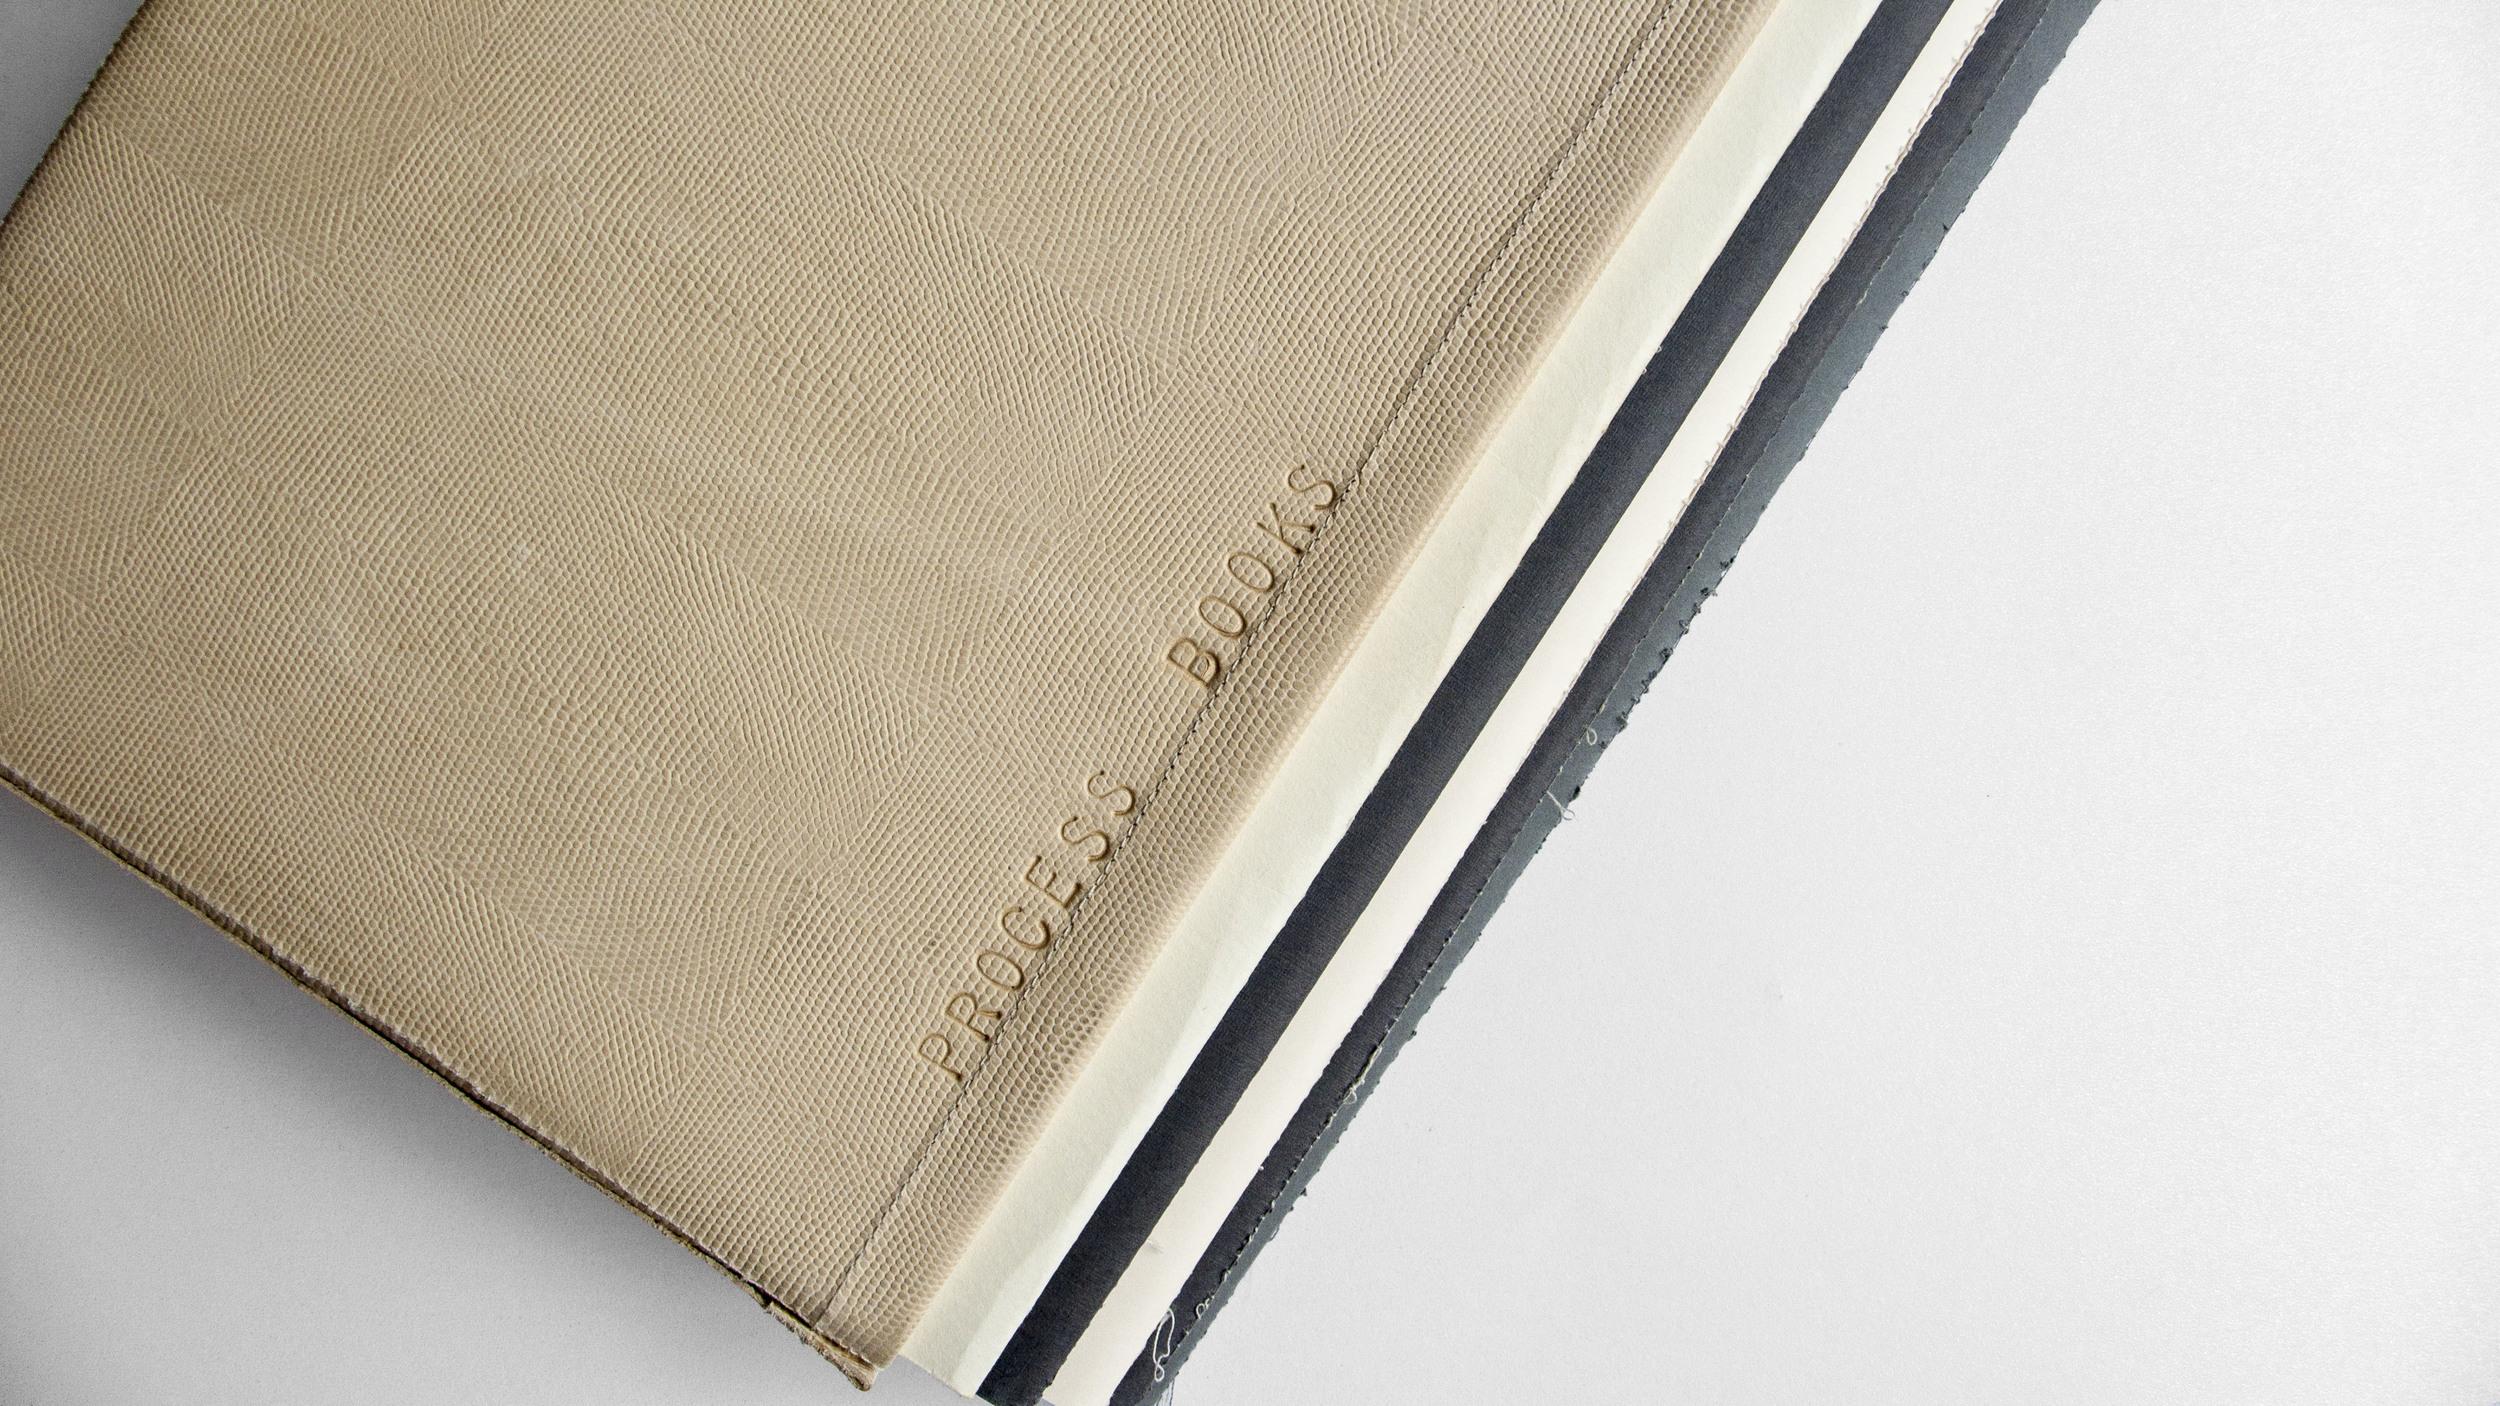 BOOKS: PROCESS BOOKS